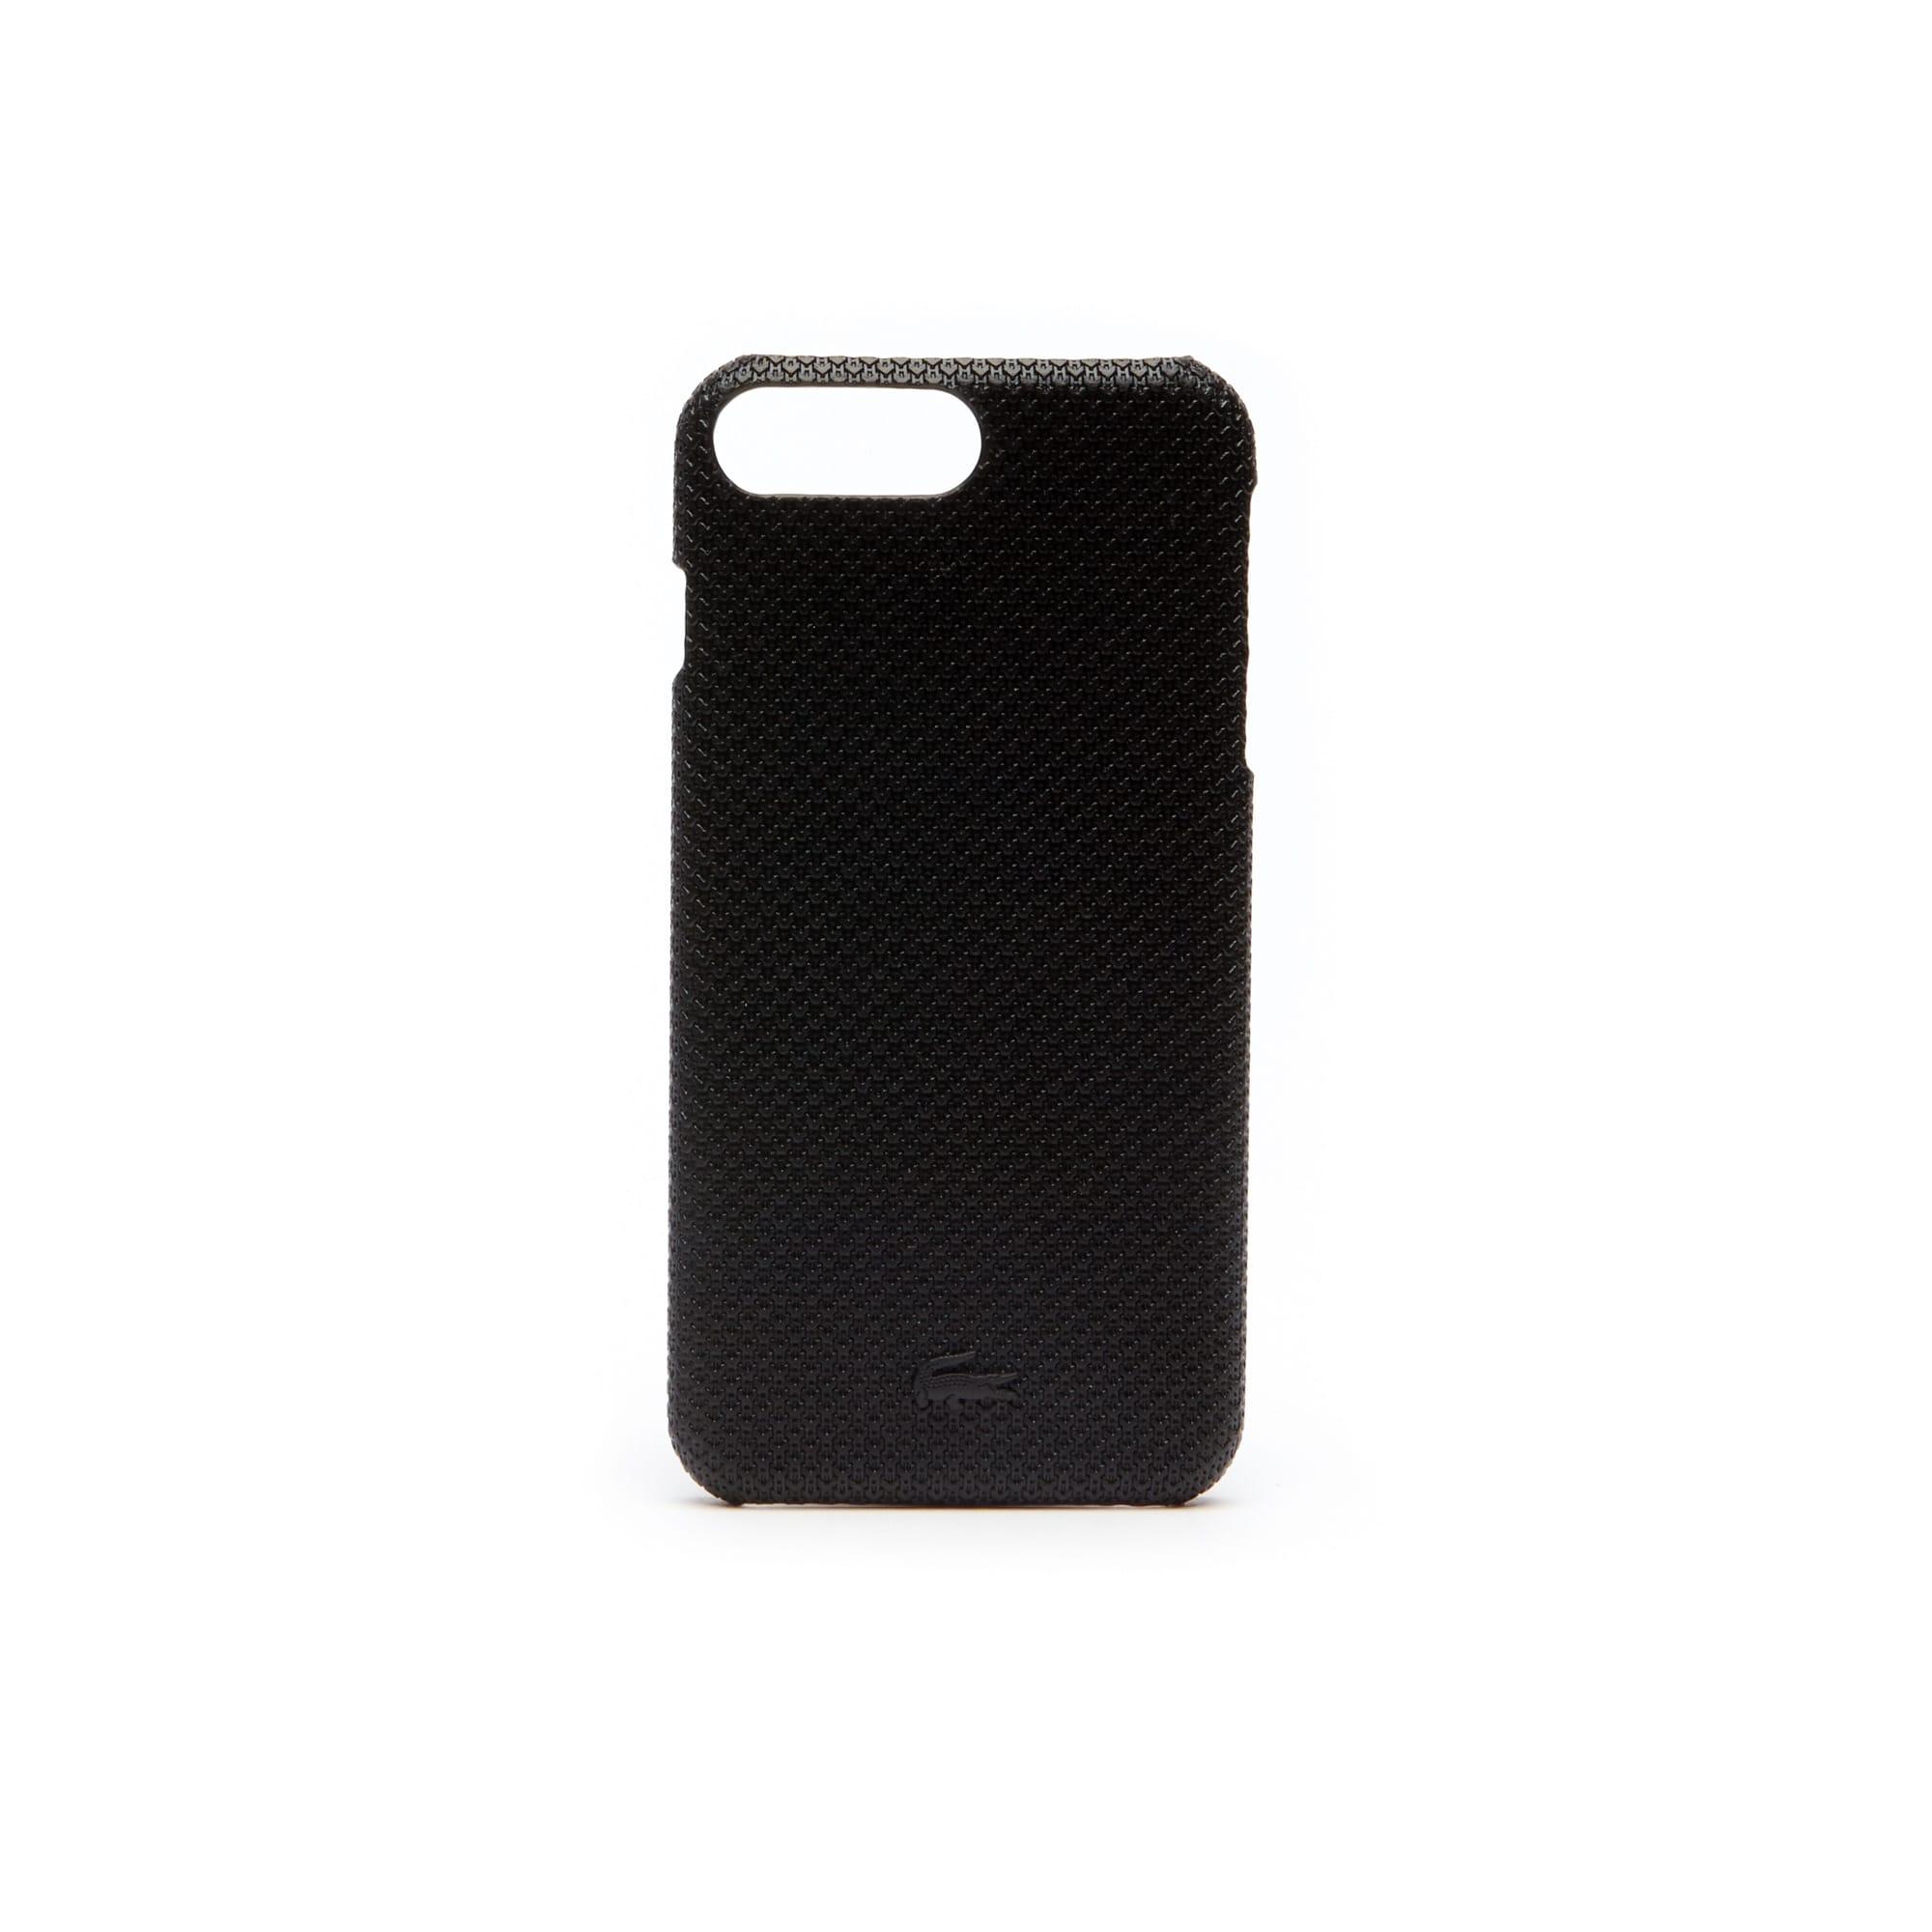 Capa para iPhone 8+ Chantaco em pele piqué mate